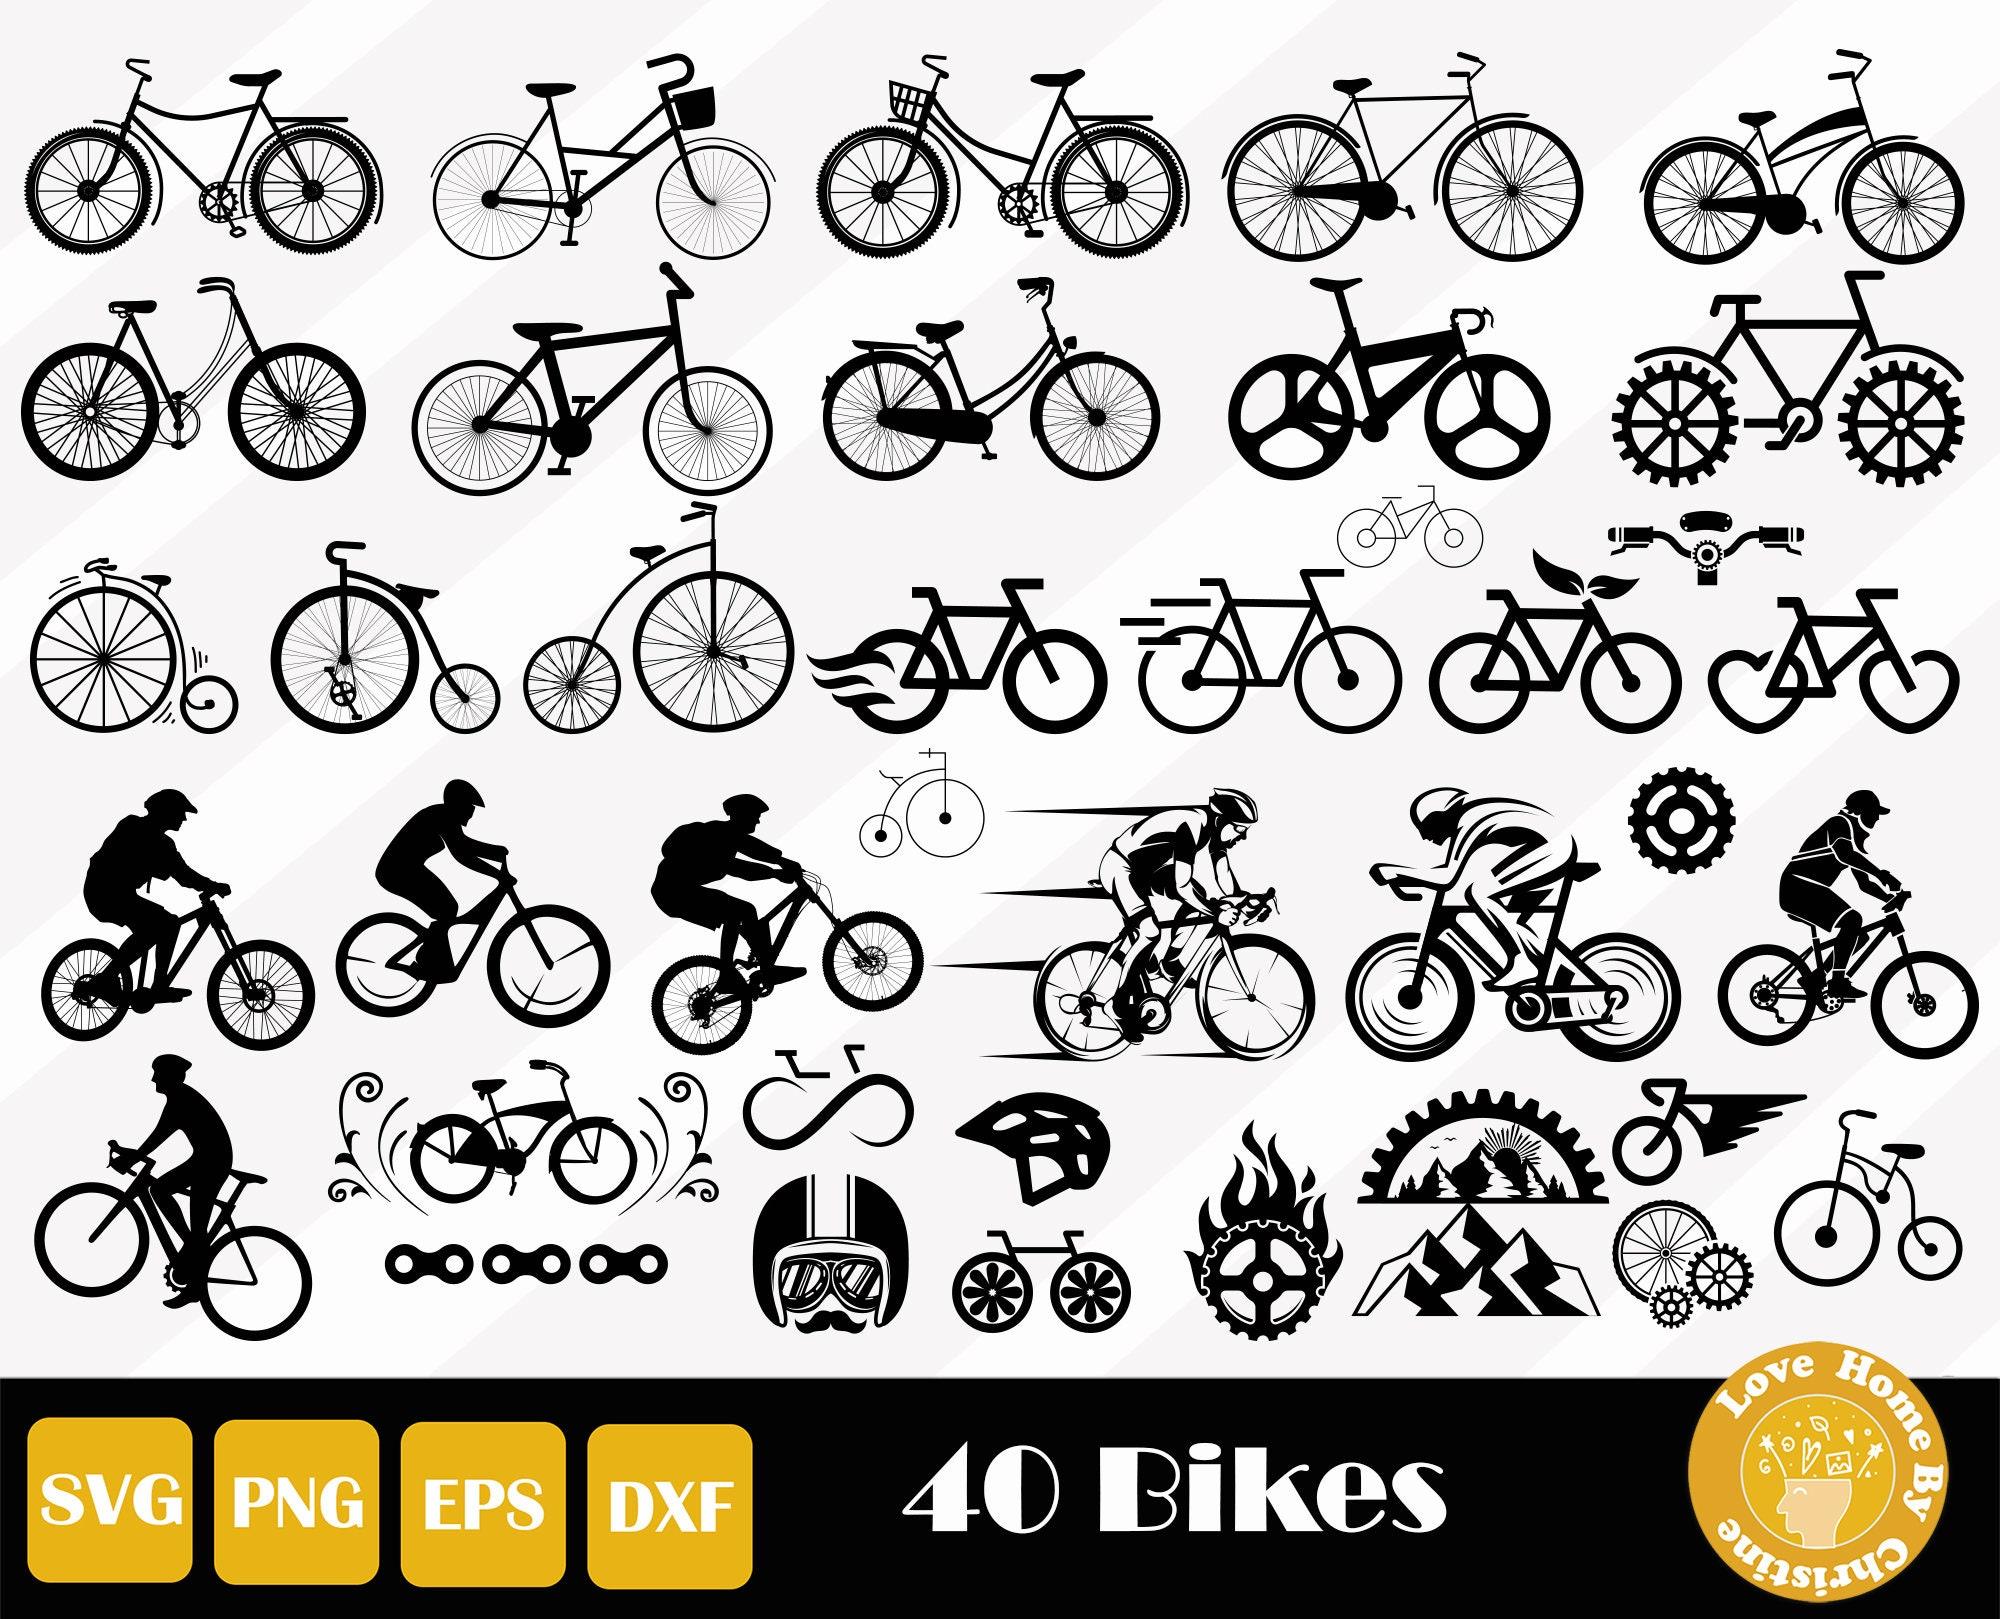 Cycologist SVG Laser Cut File Cuttable Design Bike bicycle biker Glowforge Cricut Silhouette Digital File 3D Sign Modern Decor